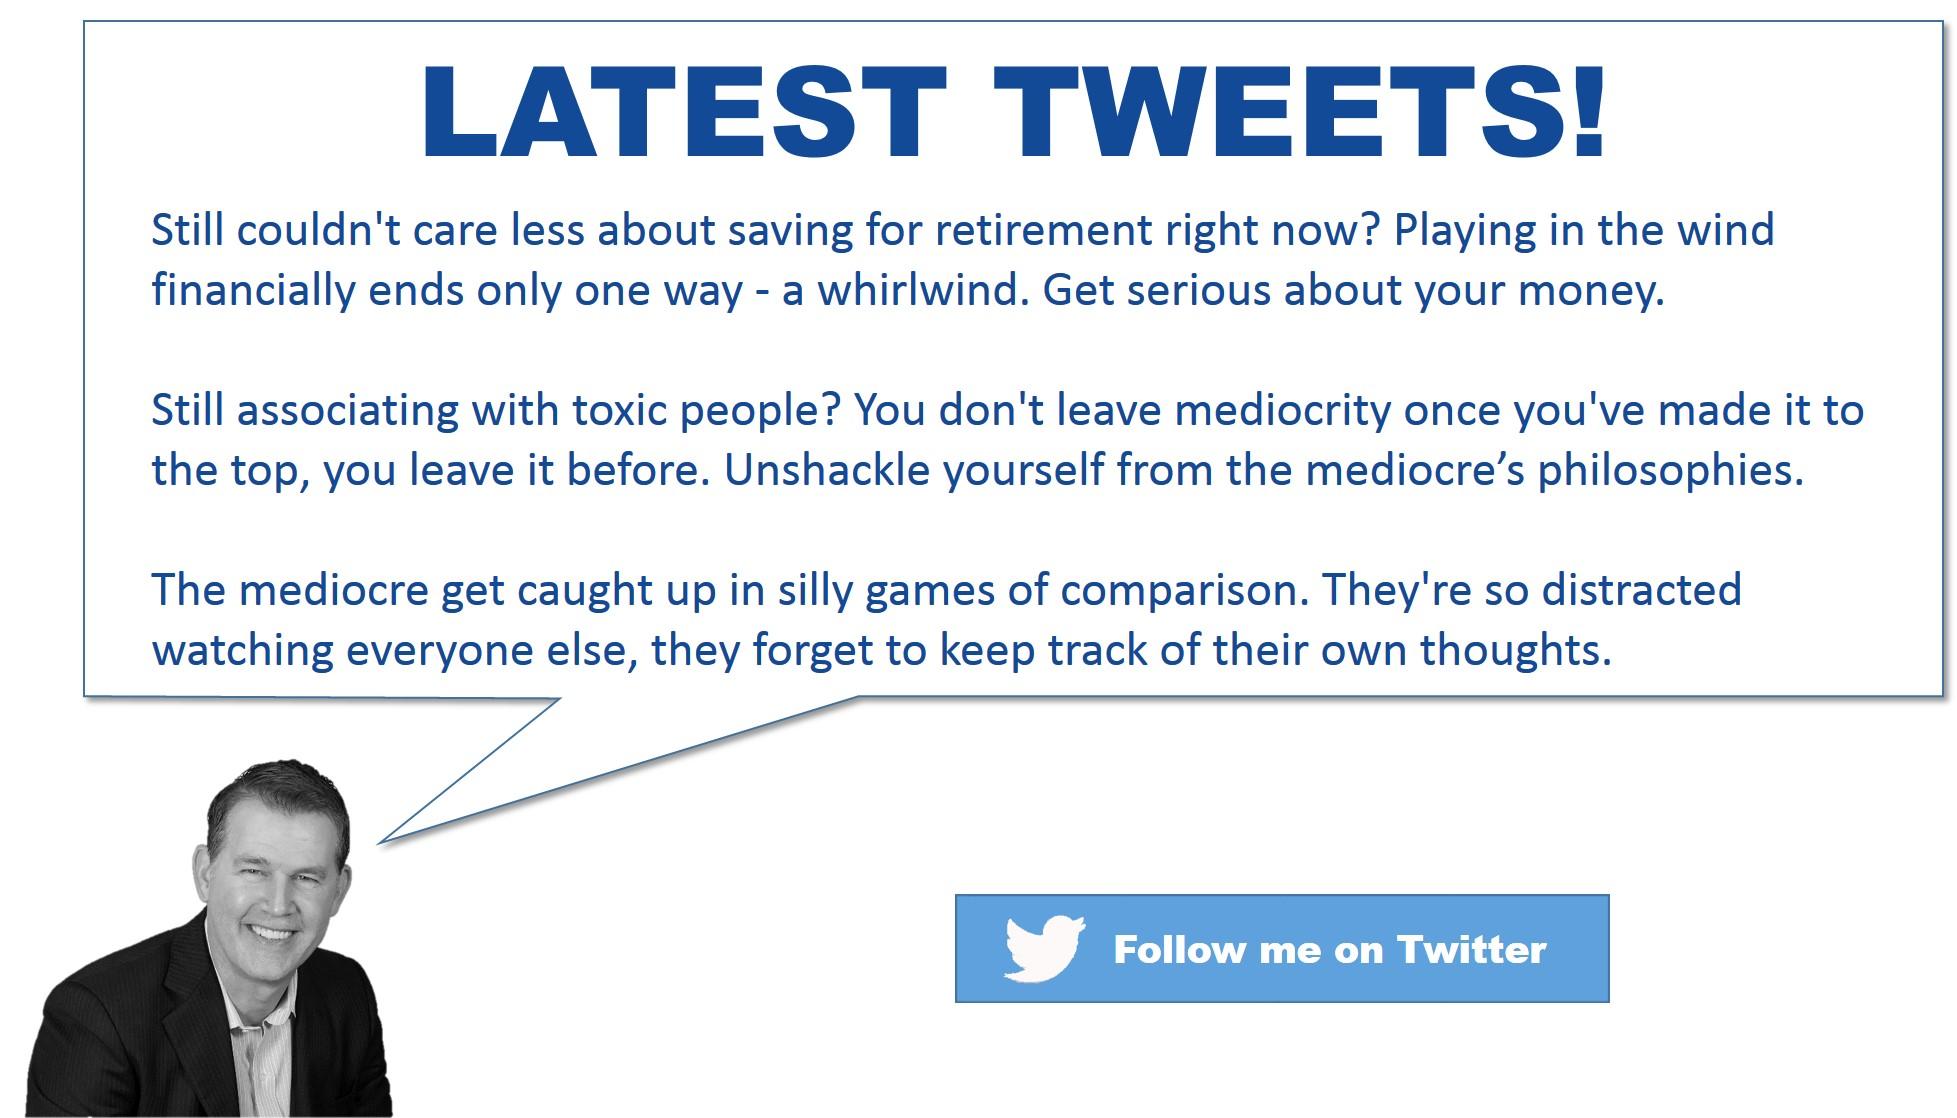 MontyCampbell-Tweets-2-23-18